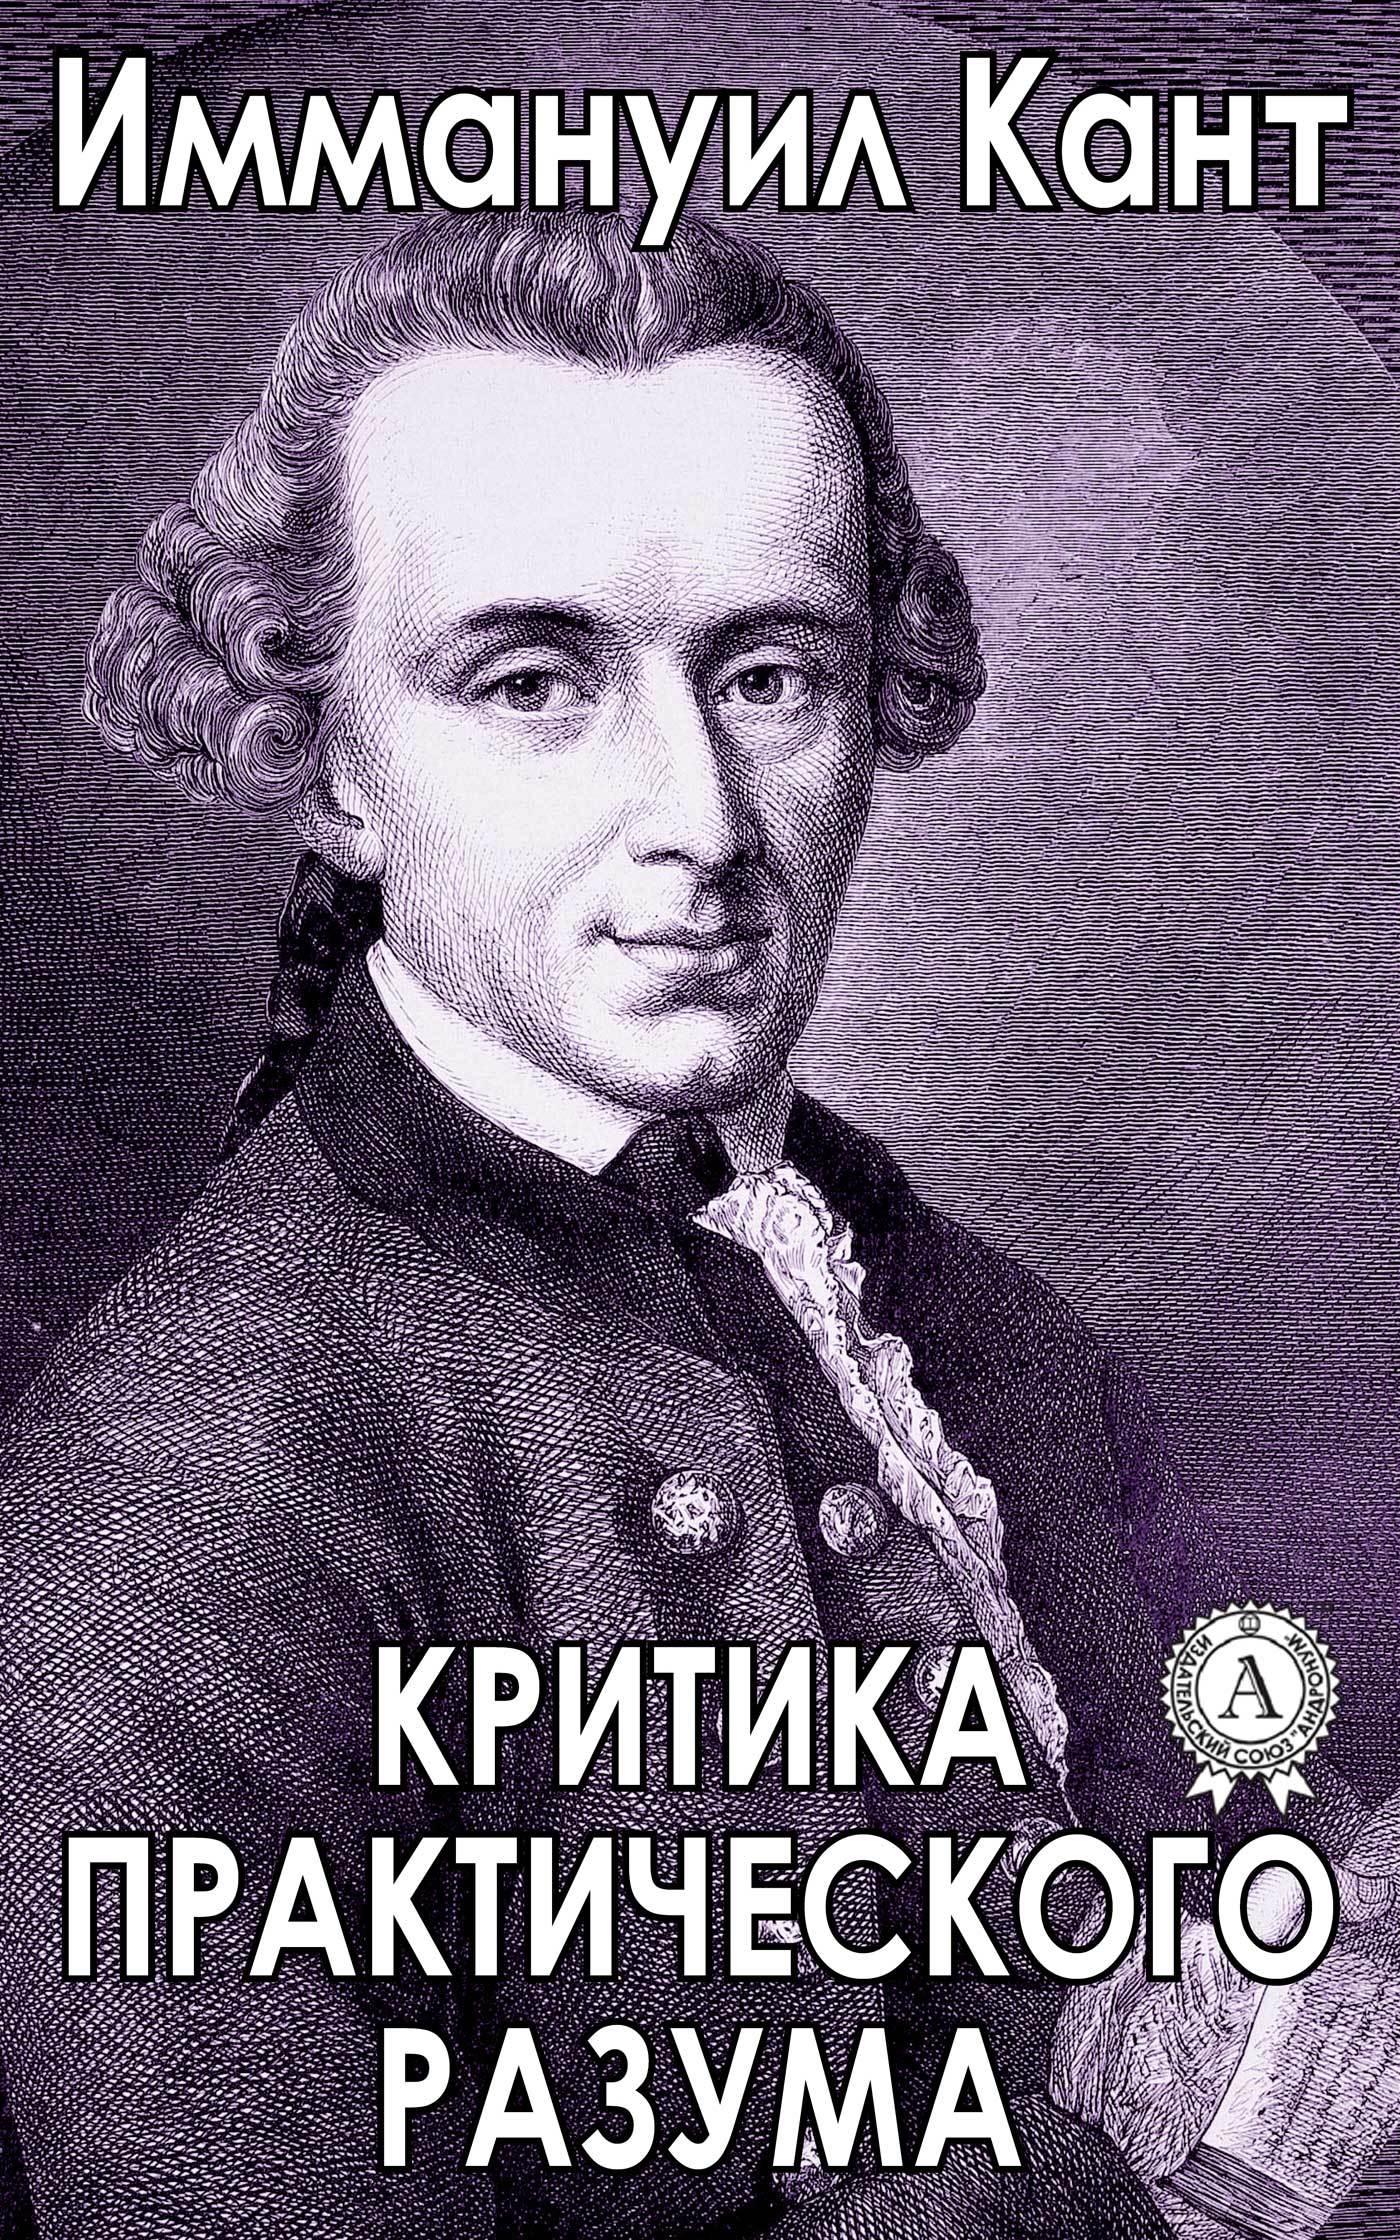 Иммануил Кант «Критика практического разума»